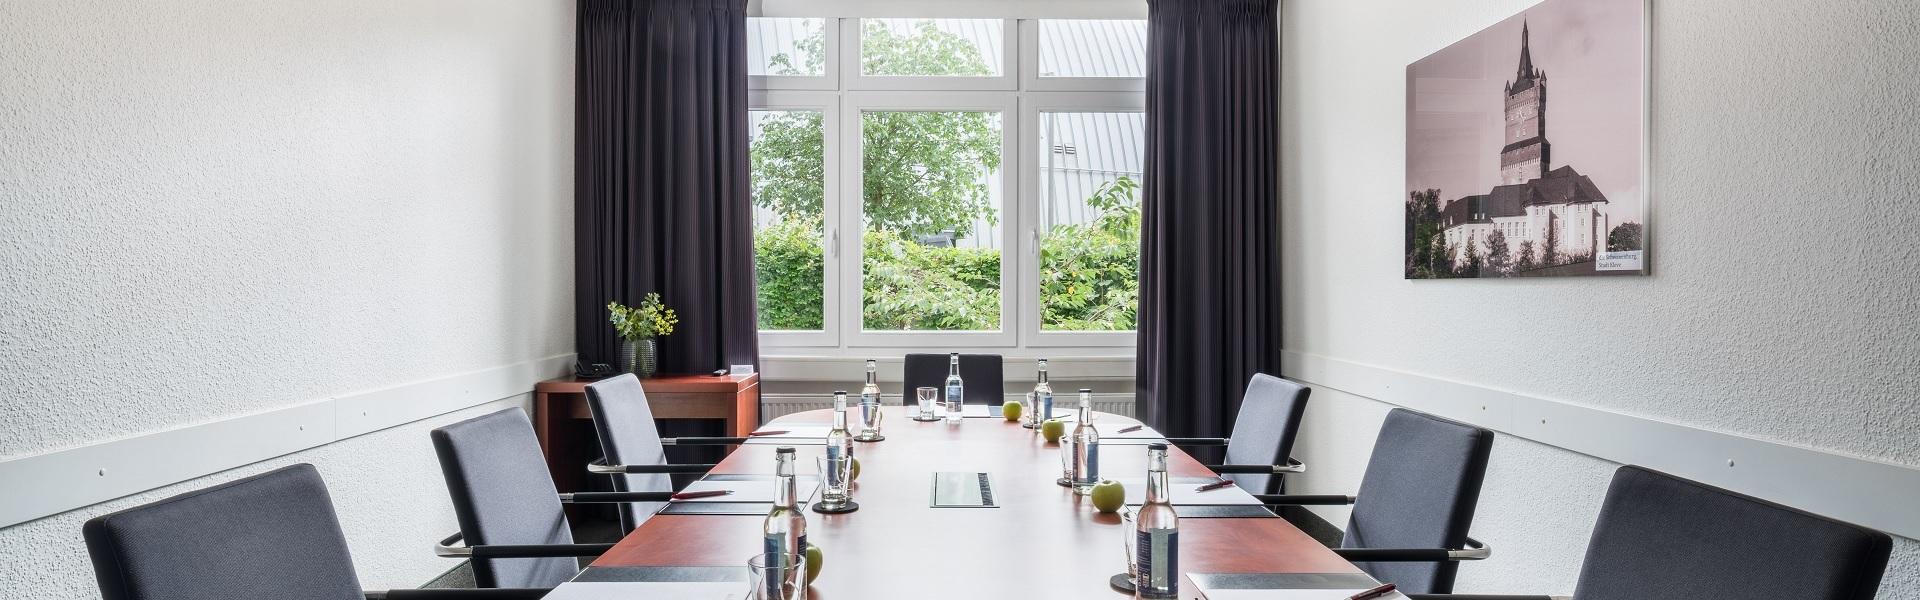 Tagungsraum Corvey Bielefelder Hof